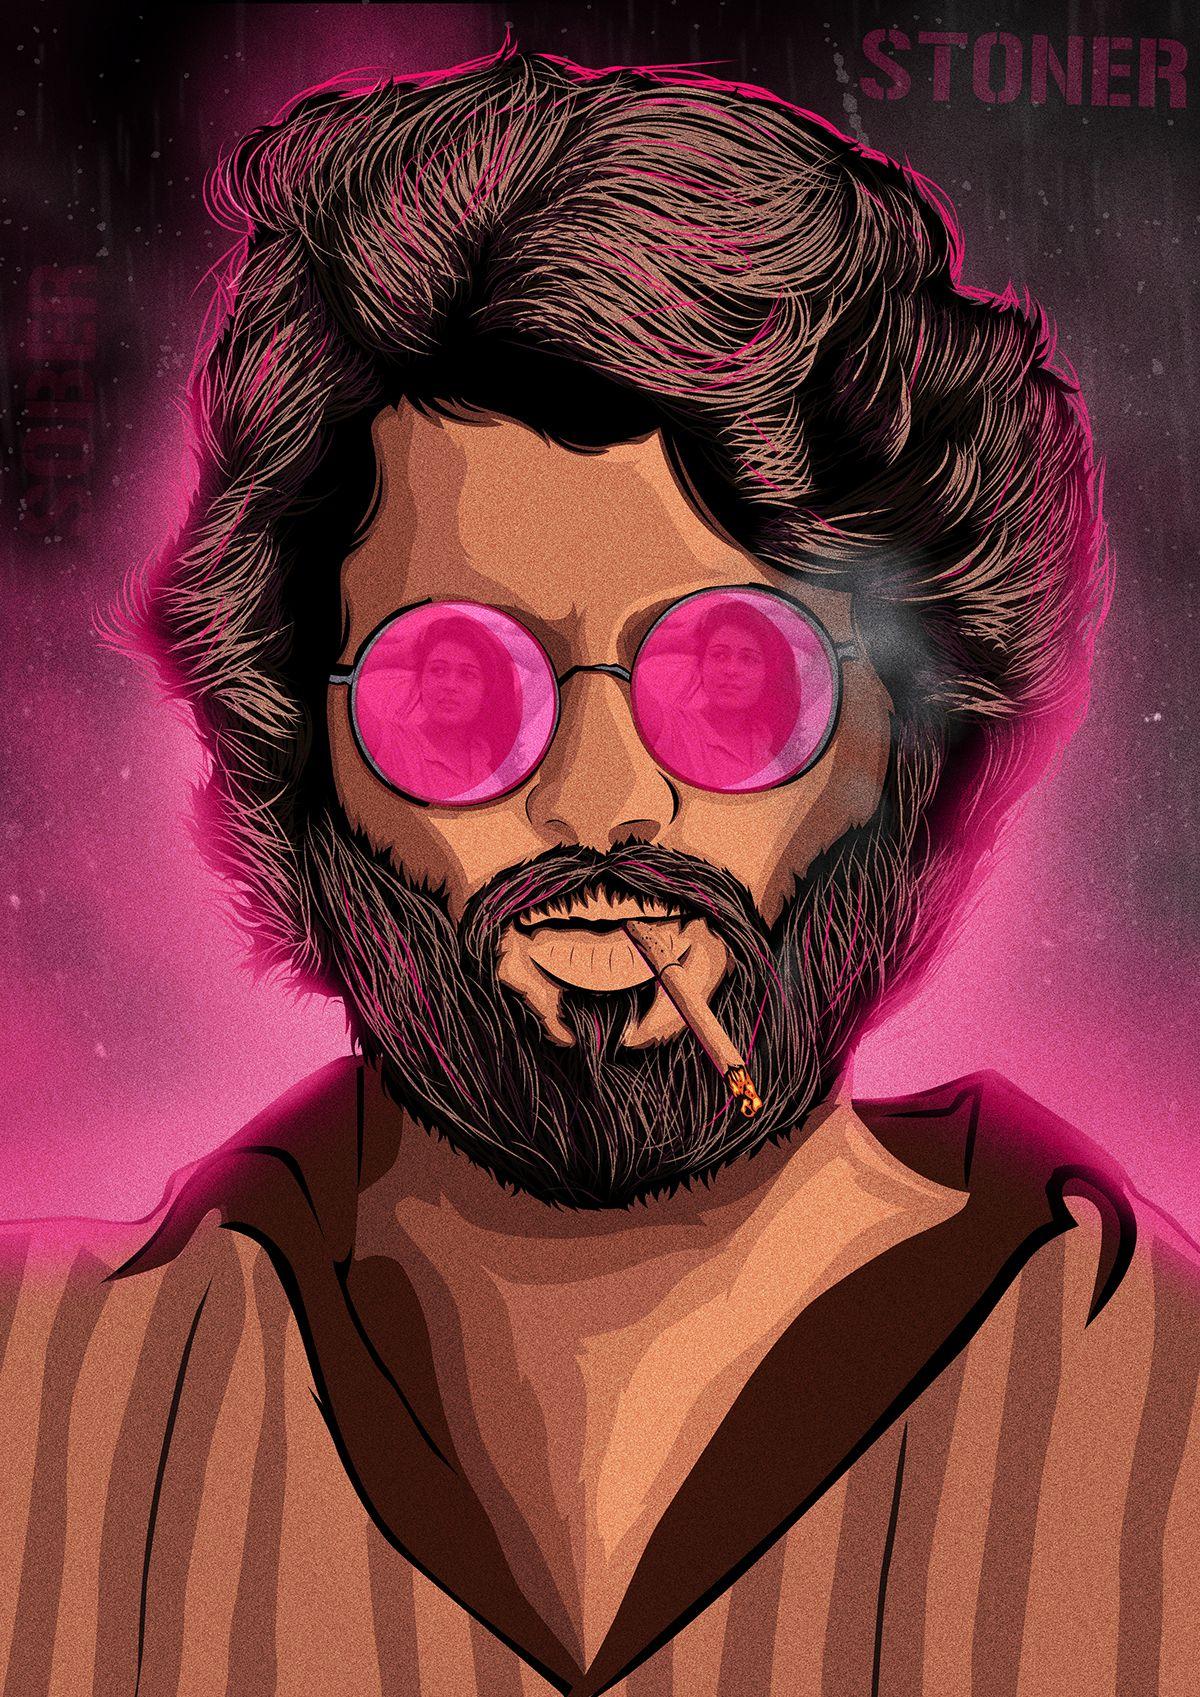 Pin By Vinay Raut On Actor Photo In 2020 Beard Art Digital Painting Portrait Movie Posters Minimalist